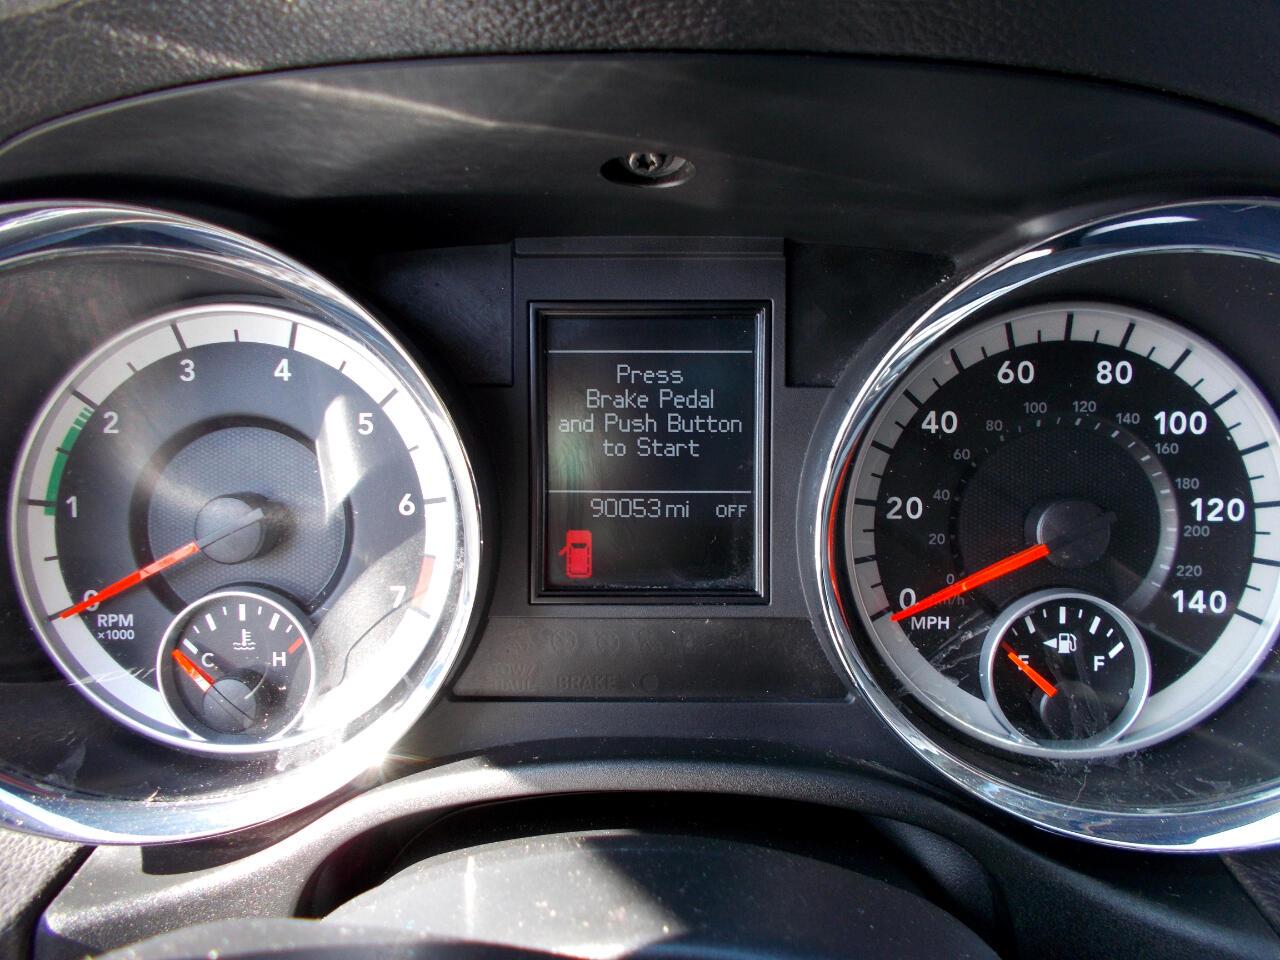 2011 Dodge Durango AWD 4dr Crew